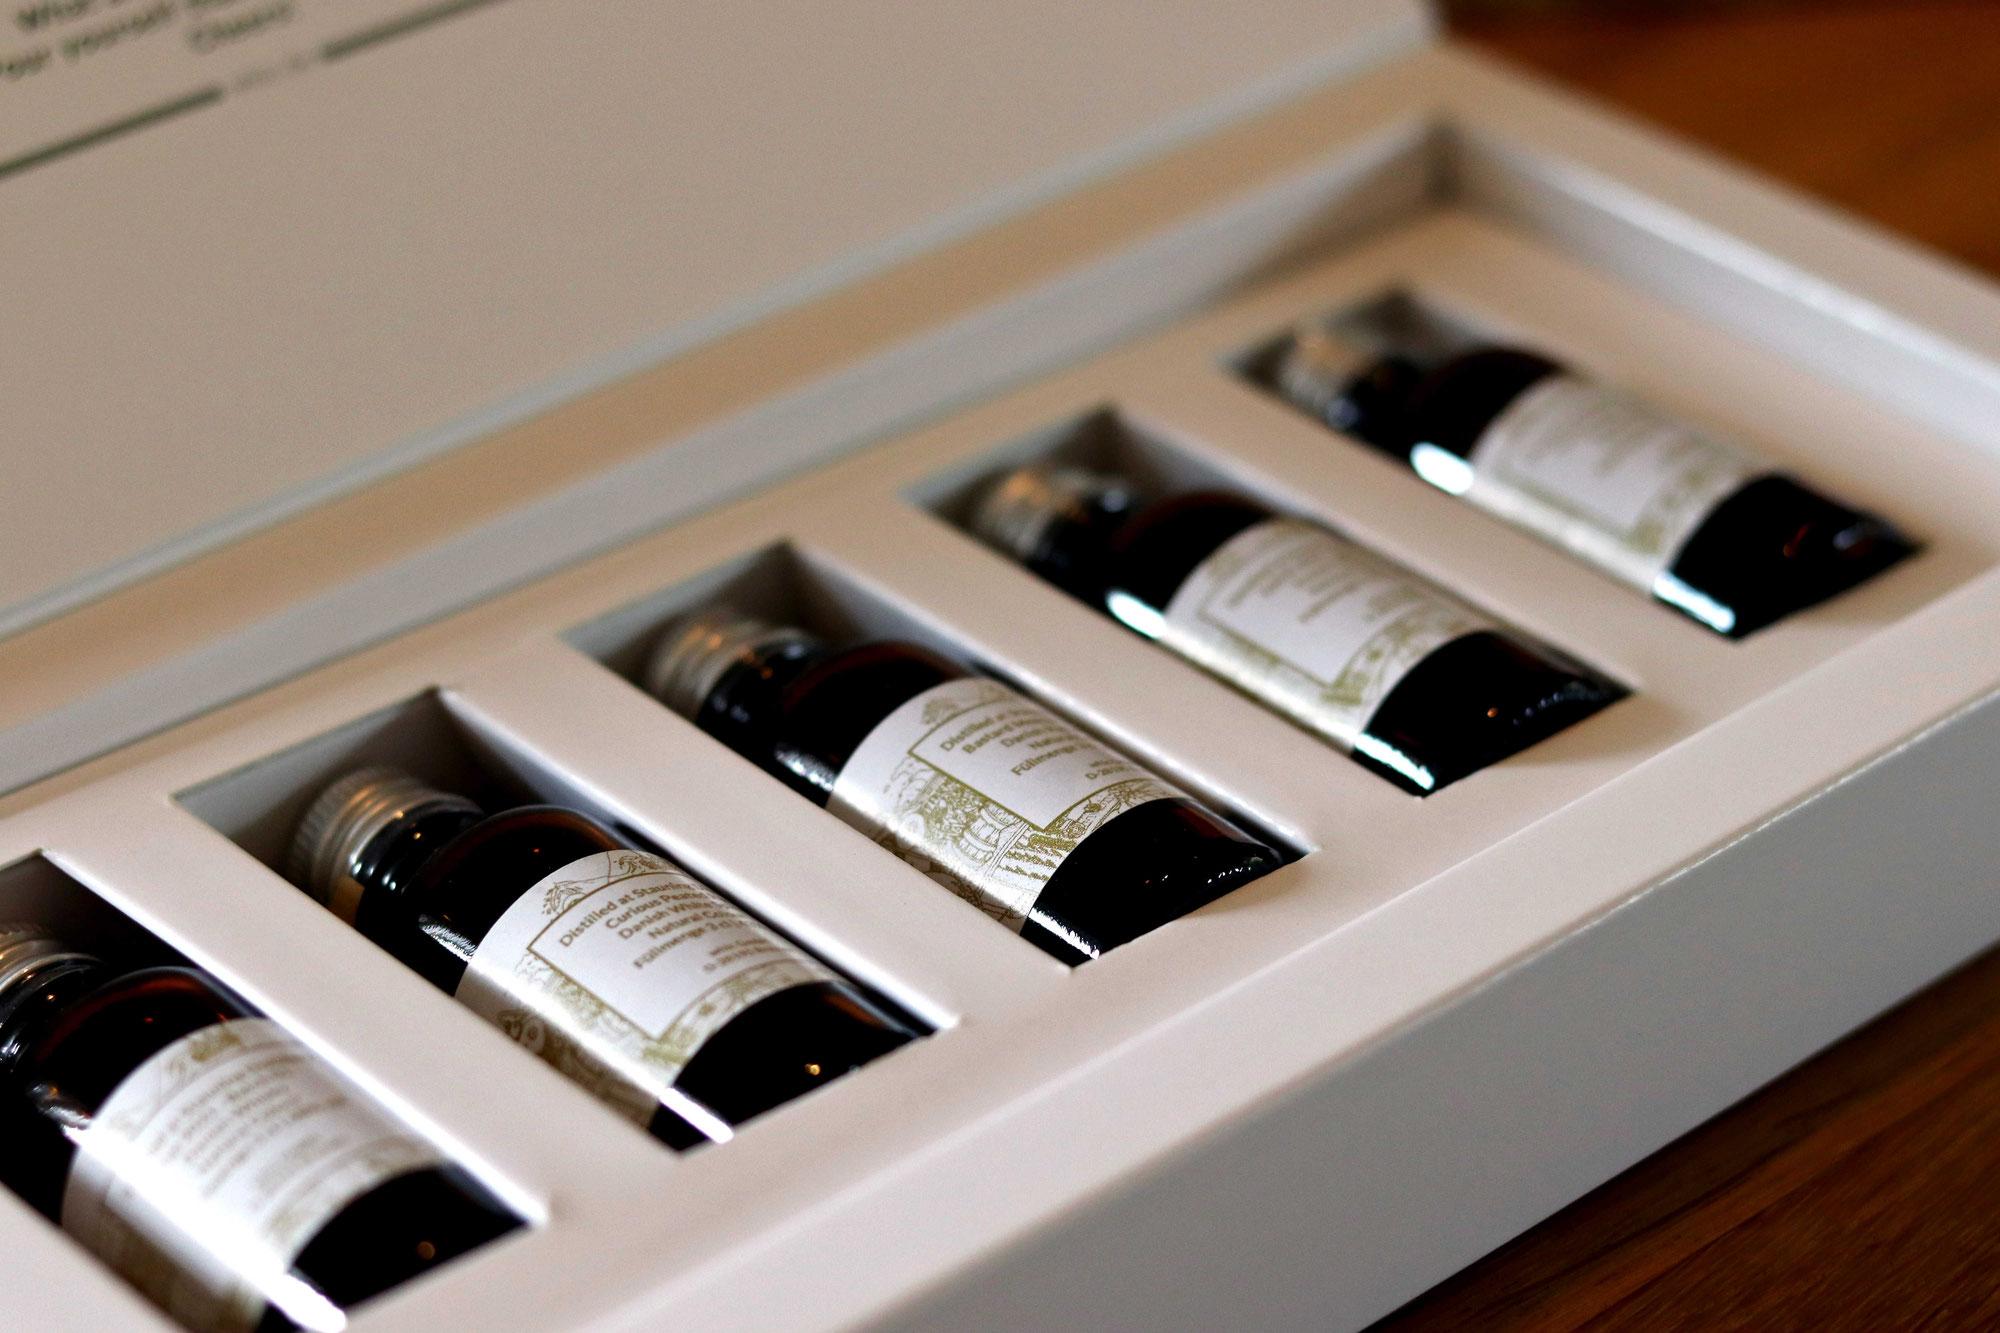 Whiskybesprechung #206: Stauning Tasting Set (Mezcal Finish, Peated Rye, KAOS, Rye, Smoke)